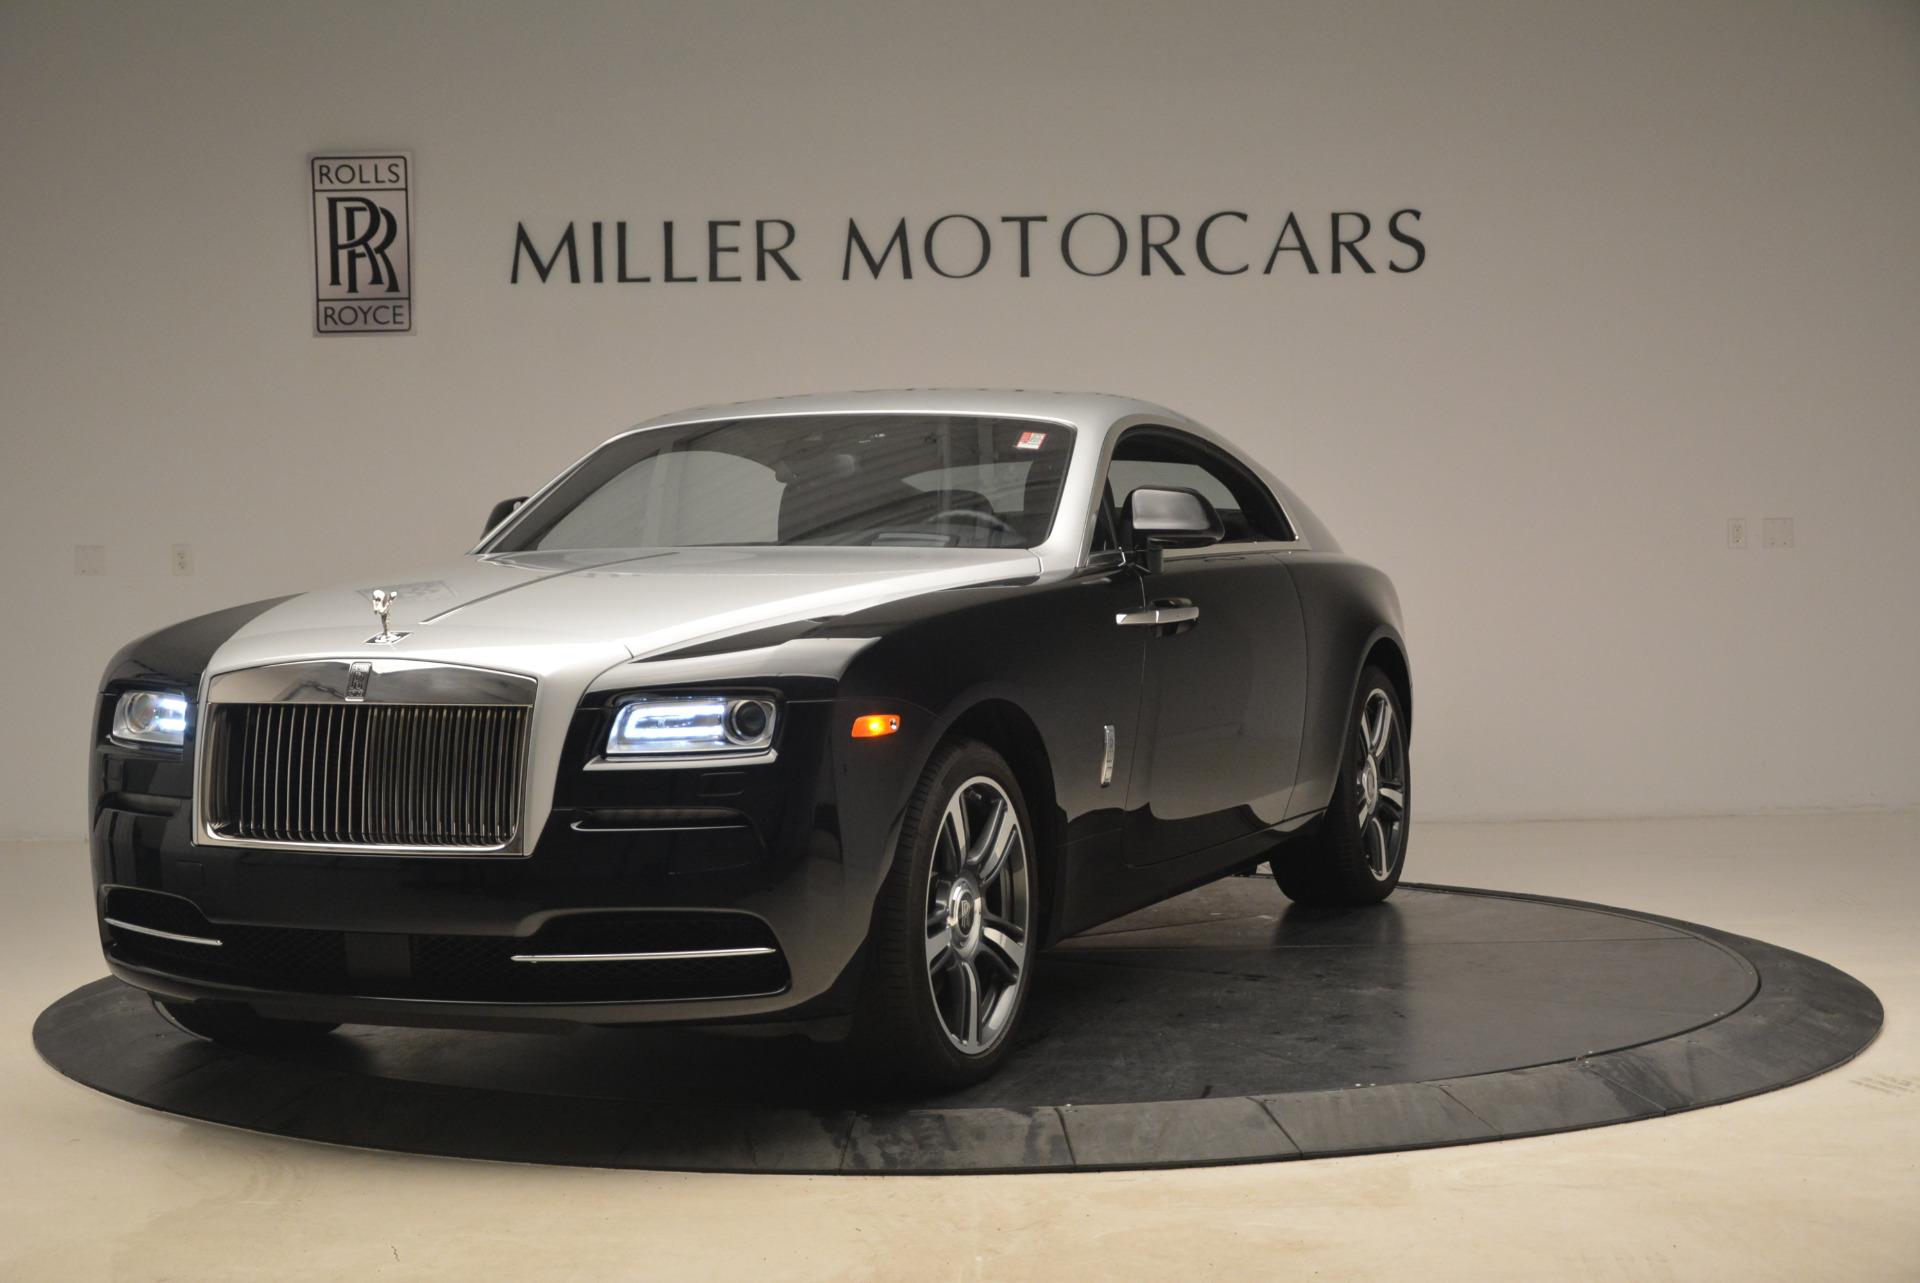 Used 2014 Rolls-Royce Wraith for sale Sold at Alfa Romeo of Westport in Westport CT 06880 1